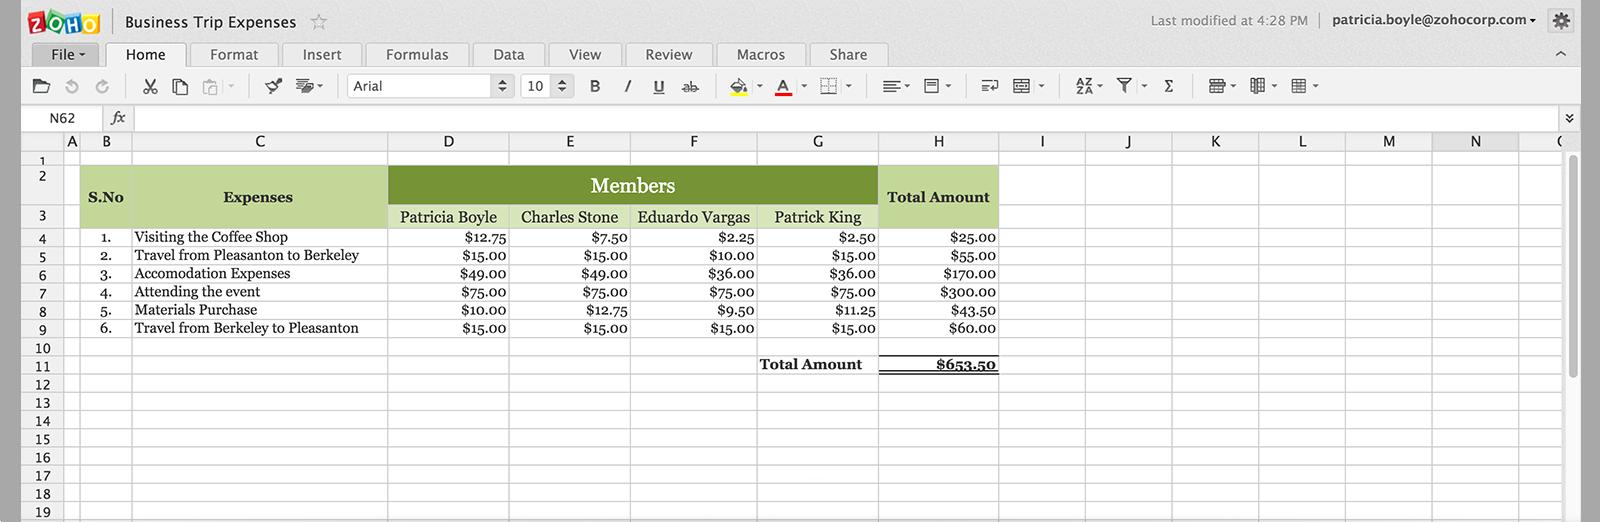 Zoho Sheet - Online Spreadsheet Application